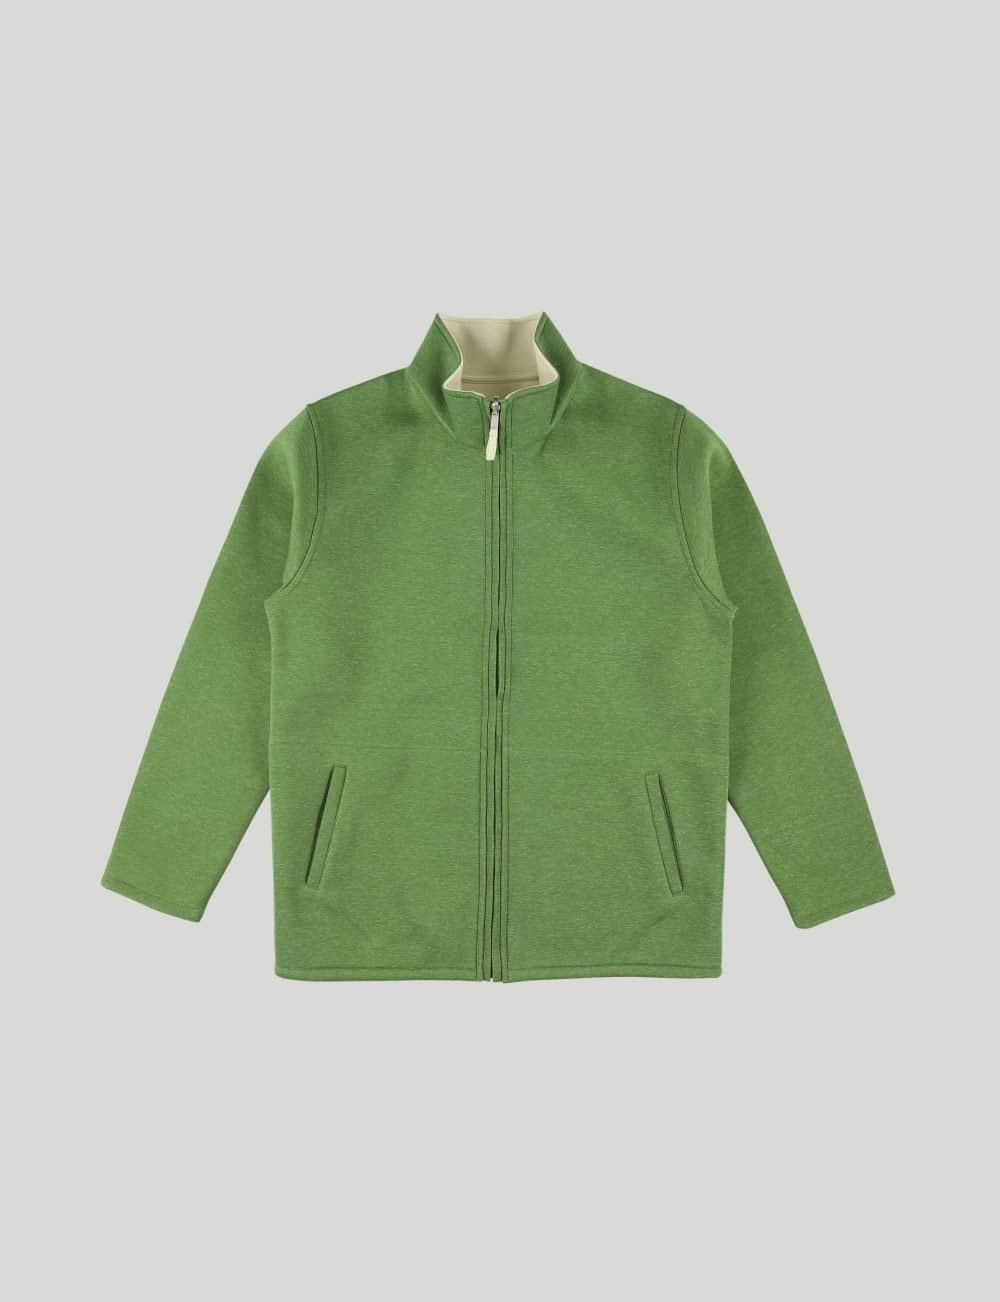 Castart - Weeping Jade Jacket - Kakhi